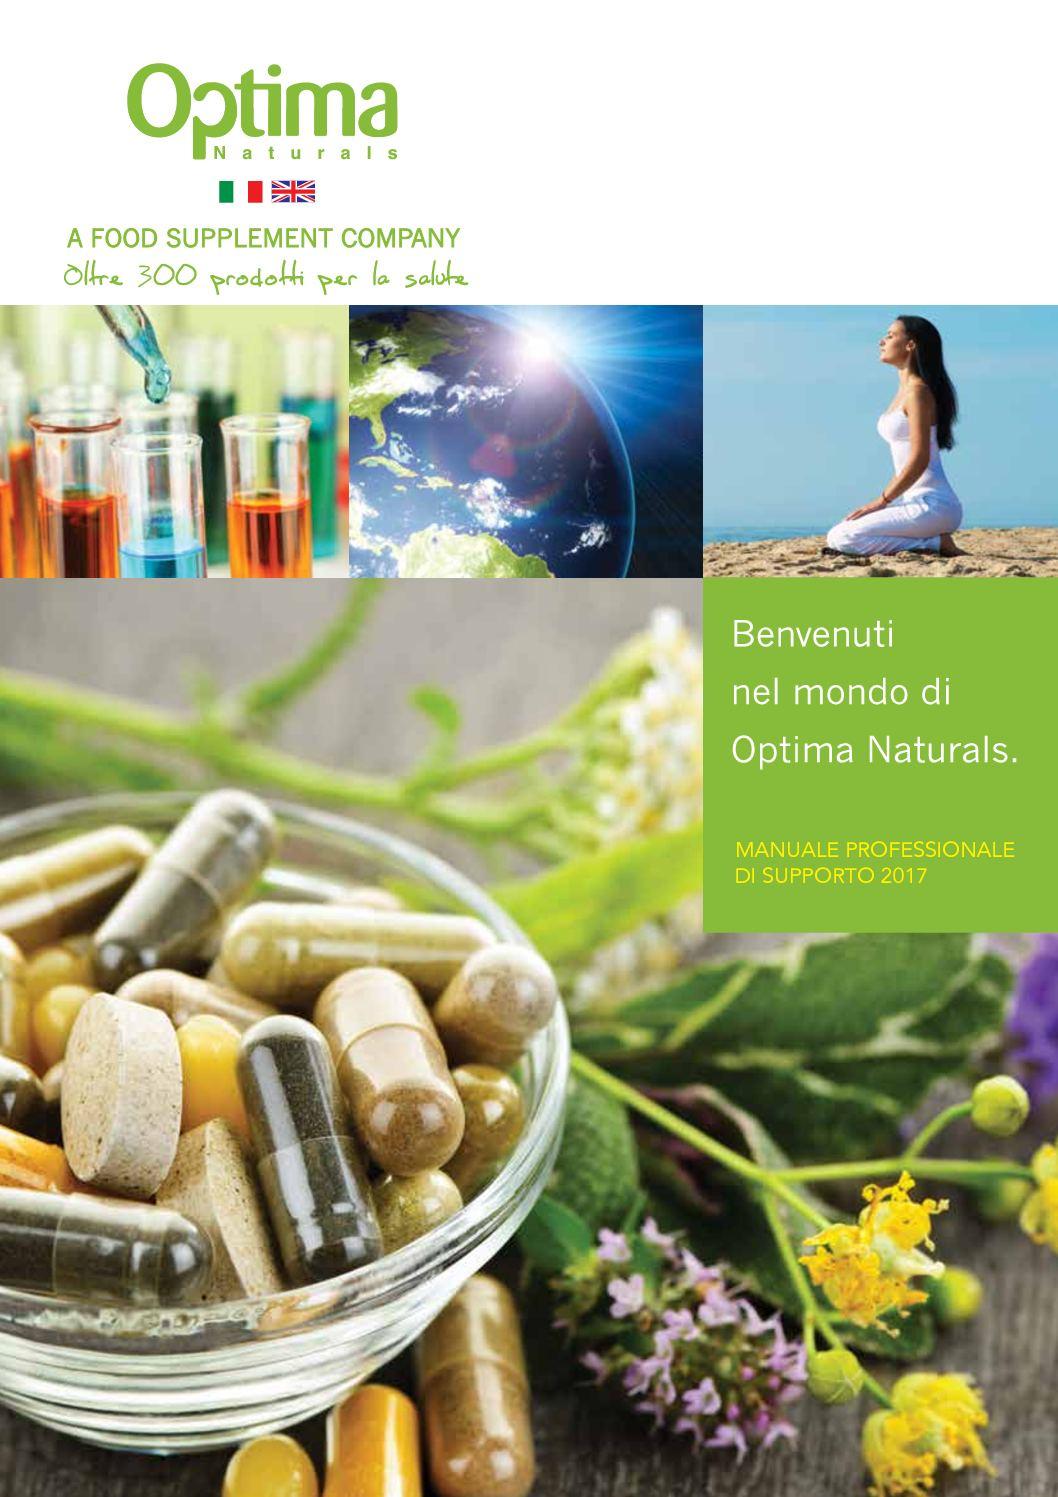 Catalogo Optima Naturals 2017